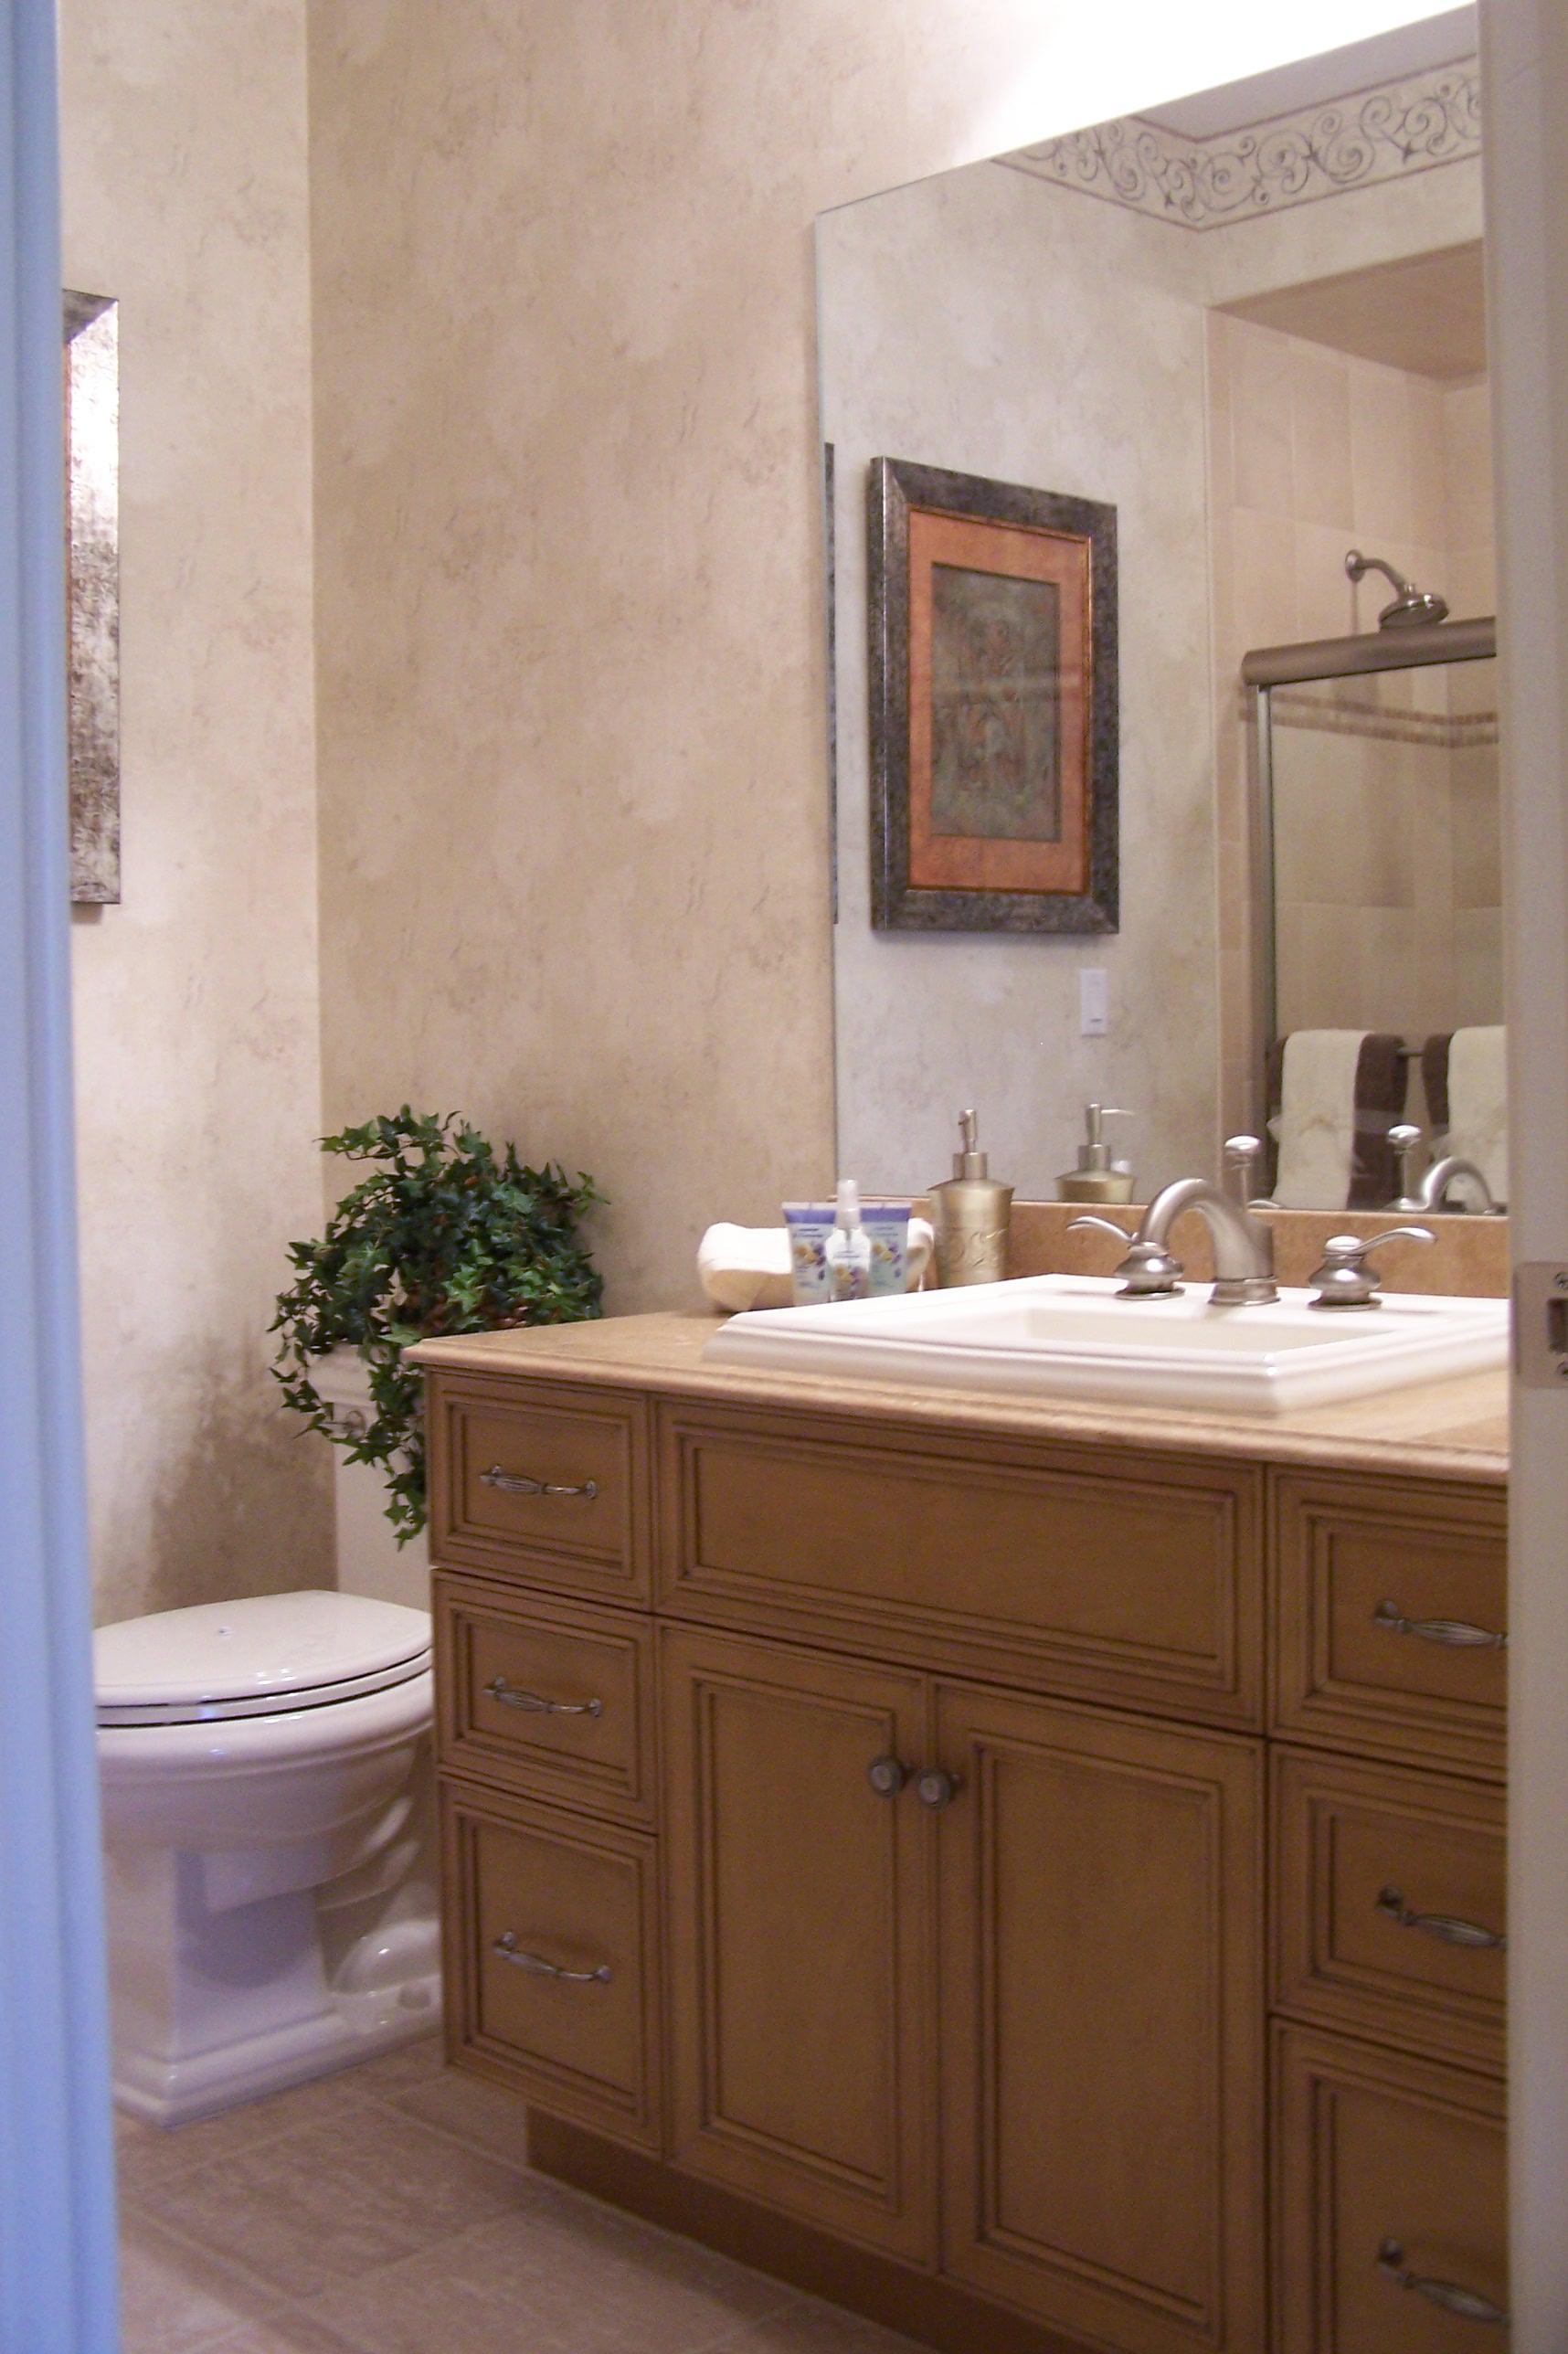 Http Www Platinumdesignsllc Com Baths Transitional 1 Html